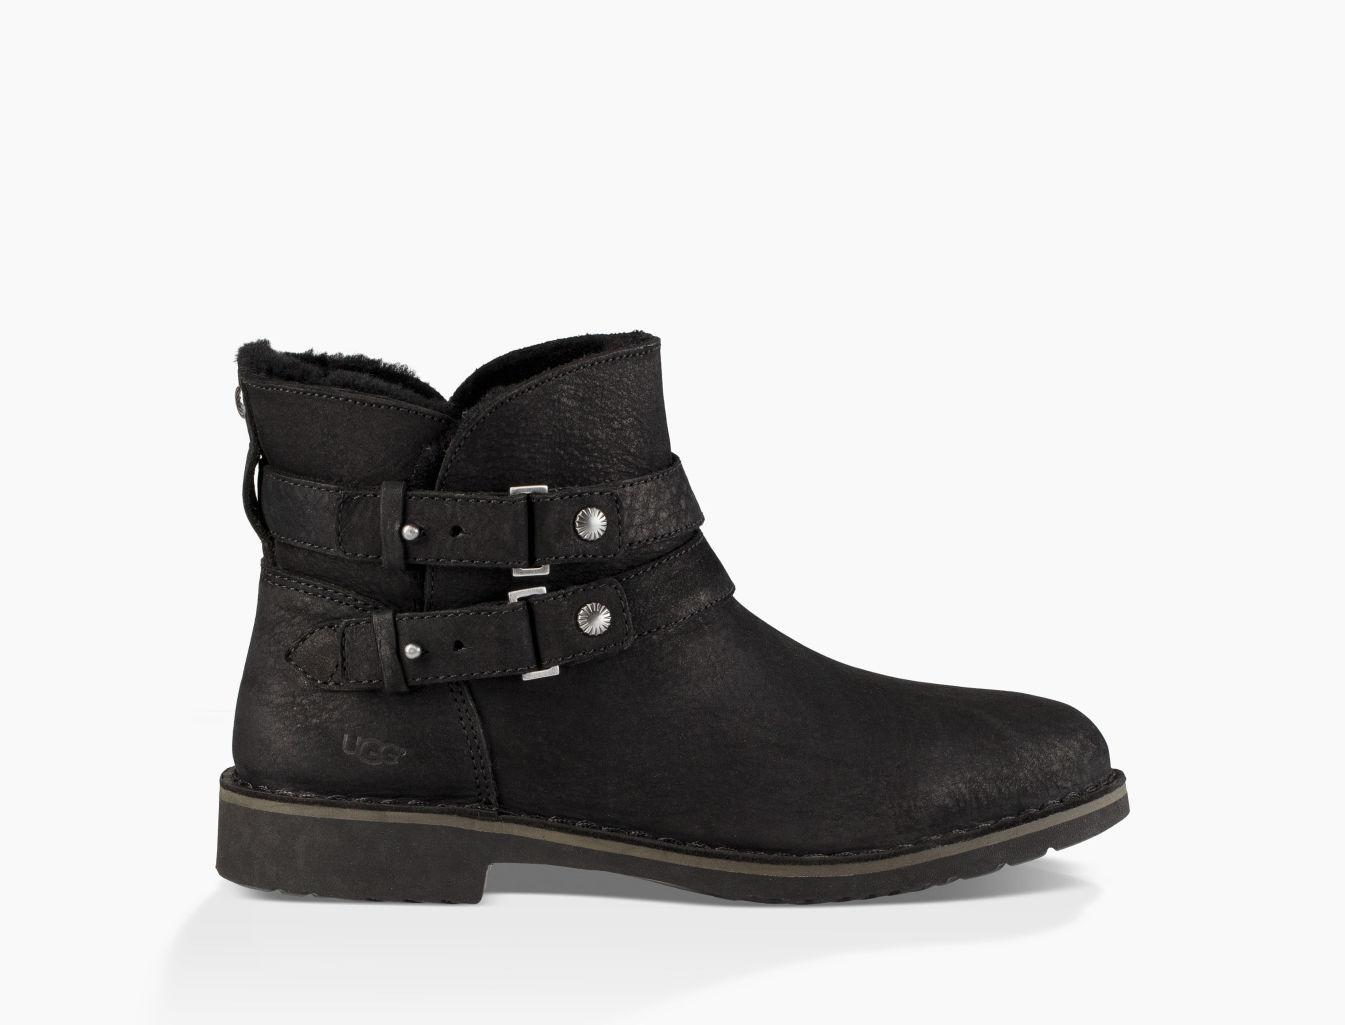 a8ed7ea105a Aliso Ankle Boots